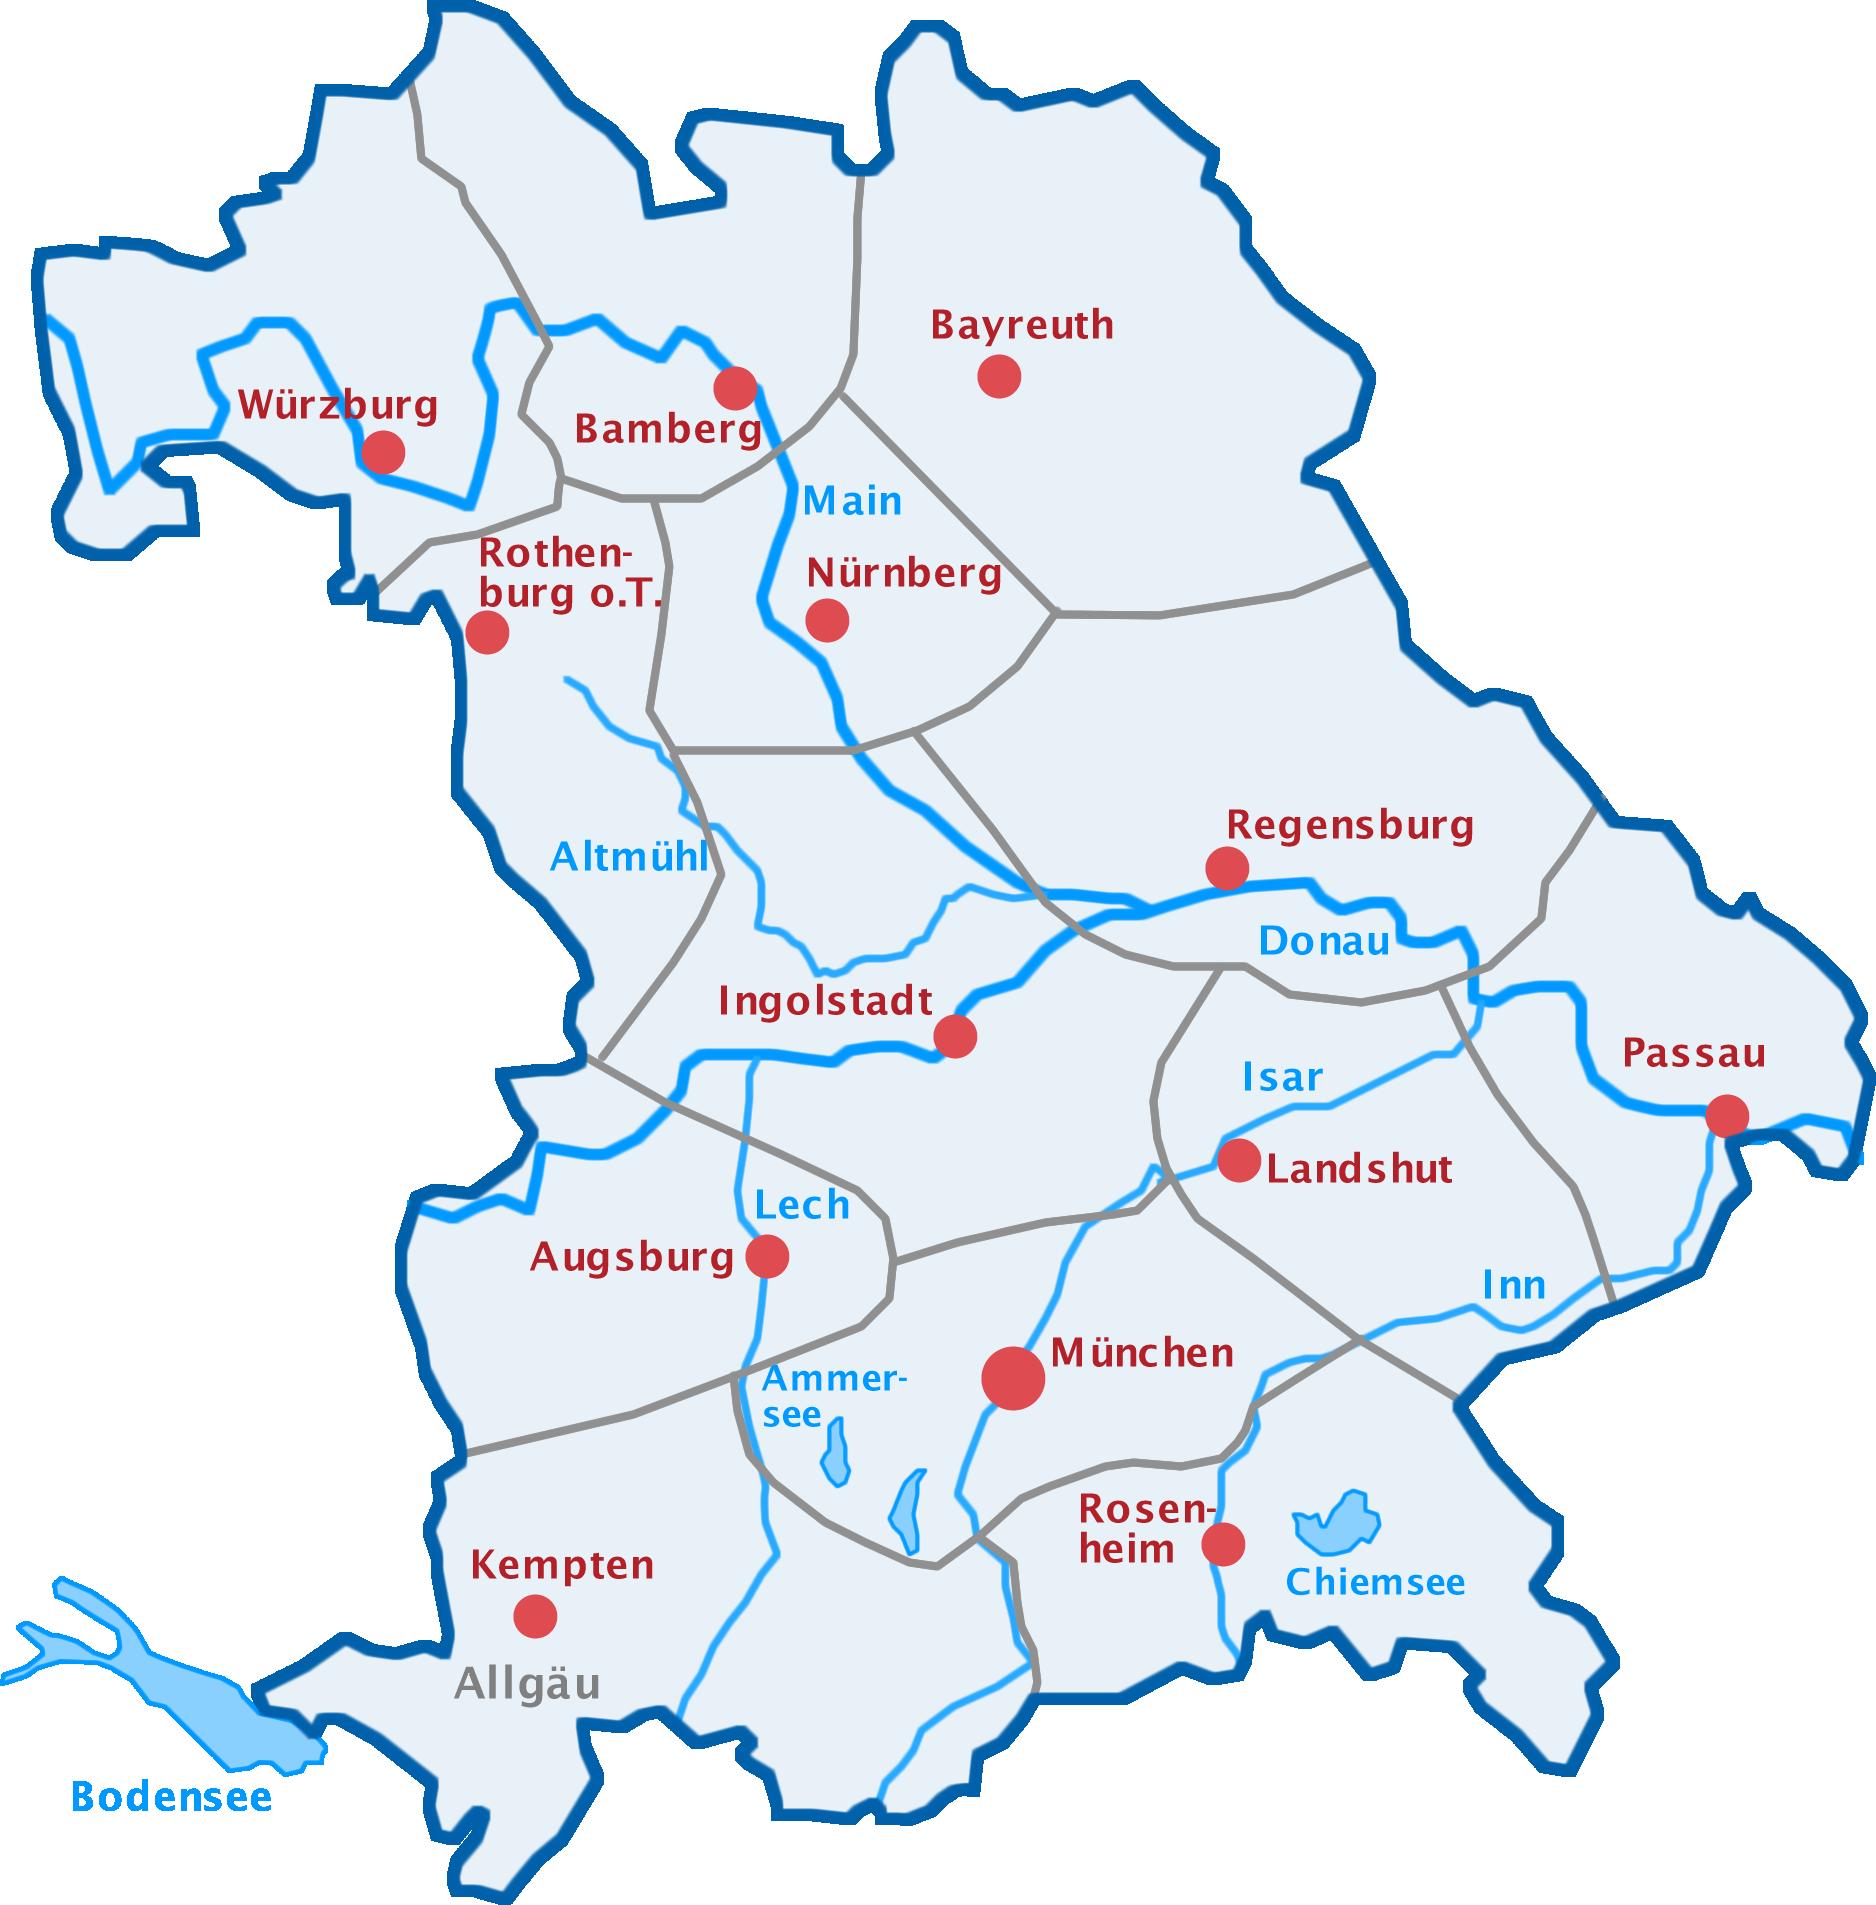 Karte Bayern.Karte Bayern 400 Prozent Senden Brandmarcom